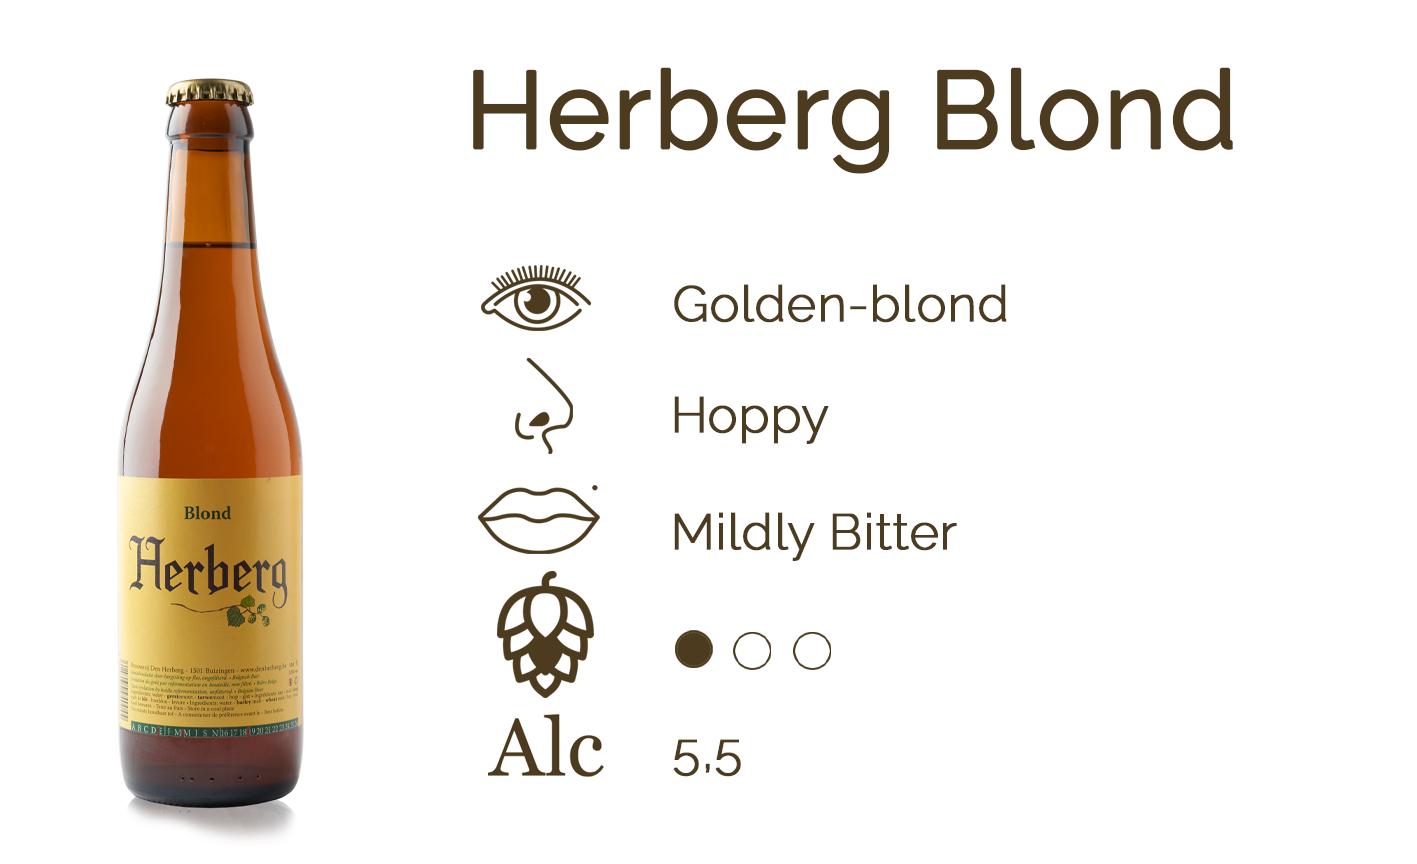 Smaakfiche voorstel 3 Herberg Blond_En